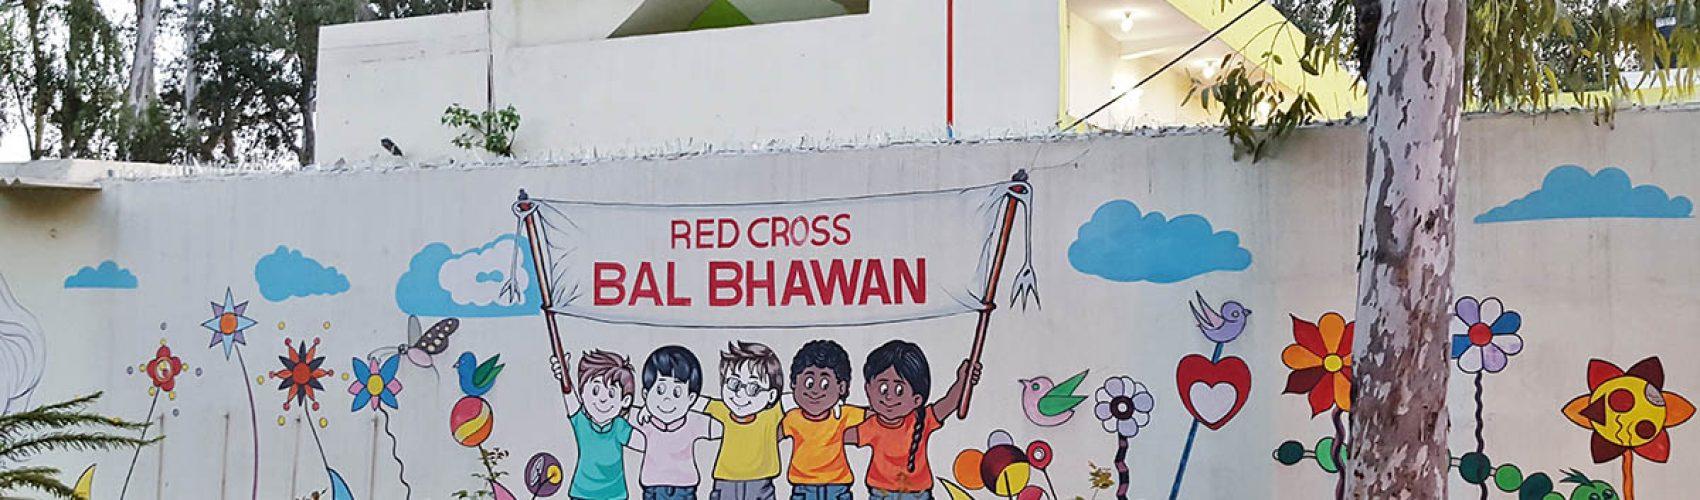 1 - Bal Bhawan